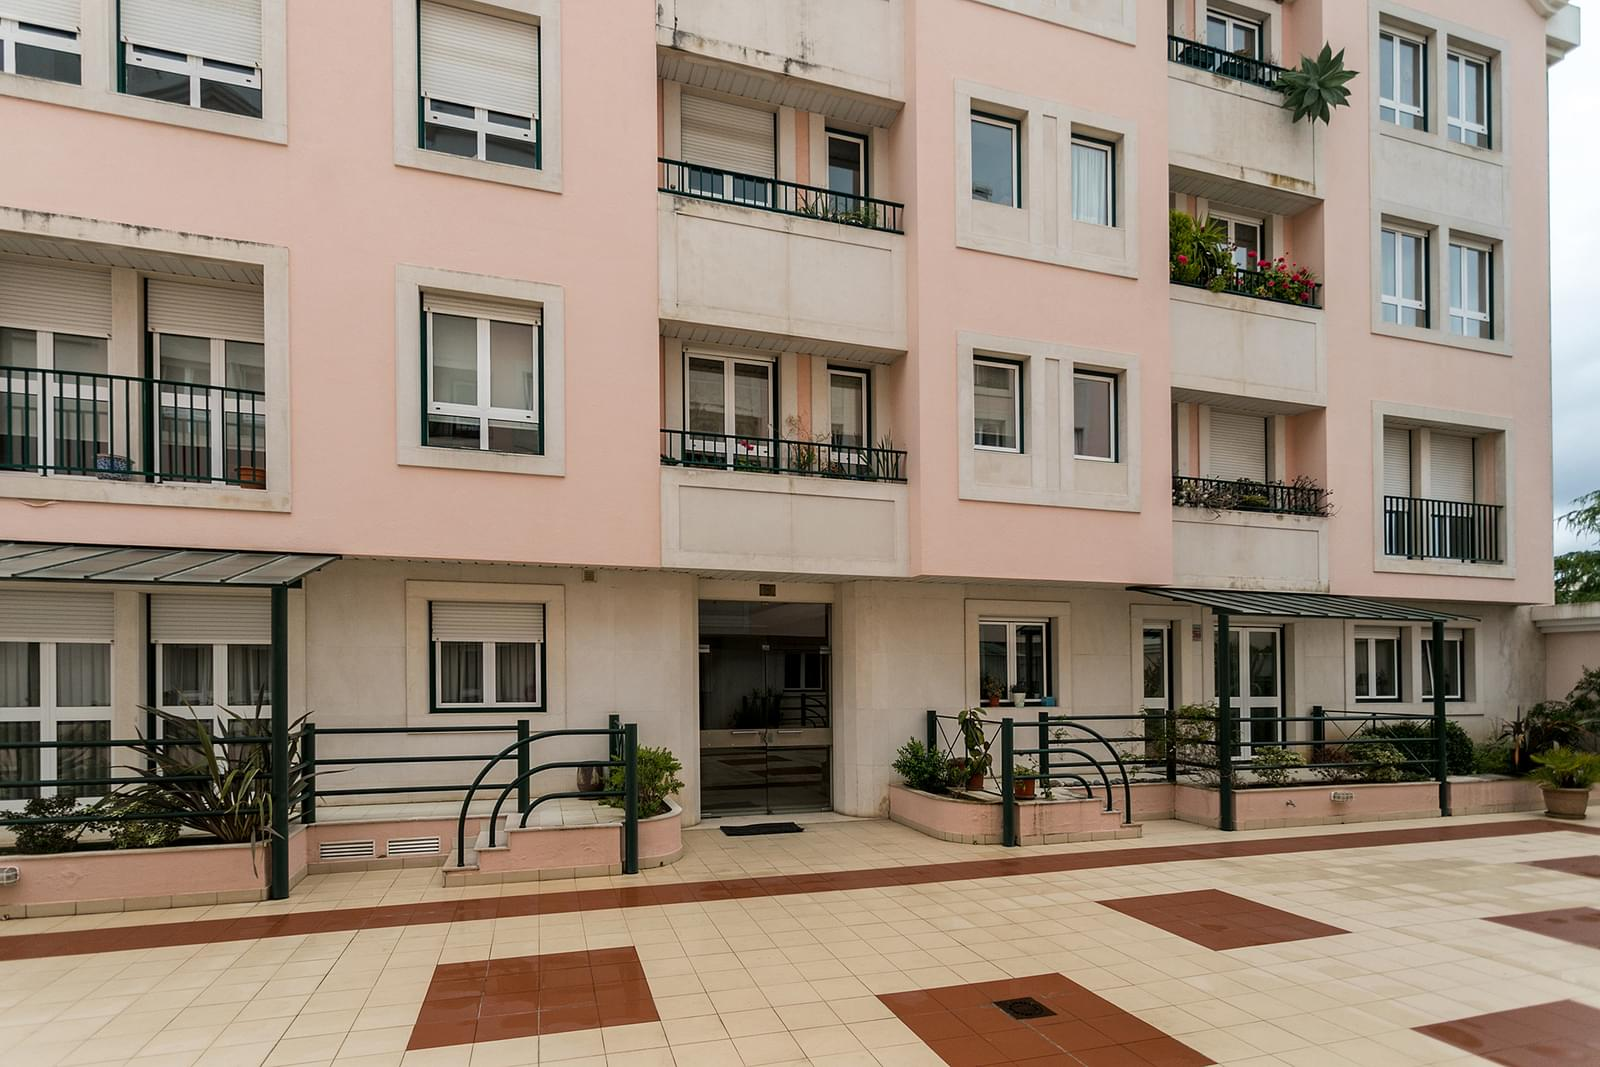 pf17352-apartamento-t3-lisboa-6d86bce2-d367-499b-ad4b-34dd16f0fc0f